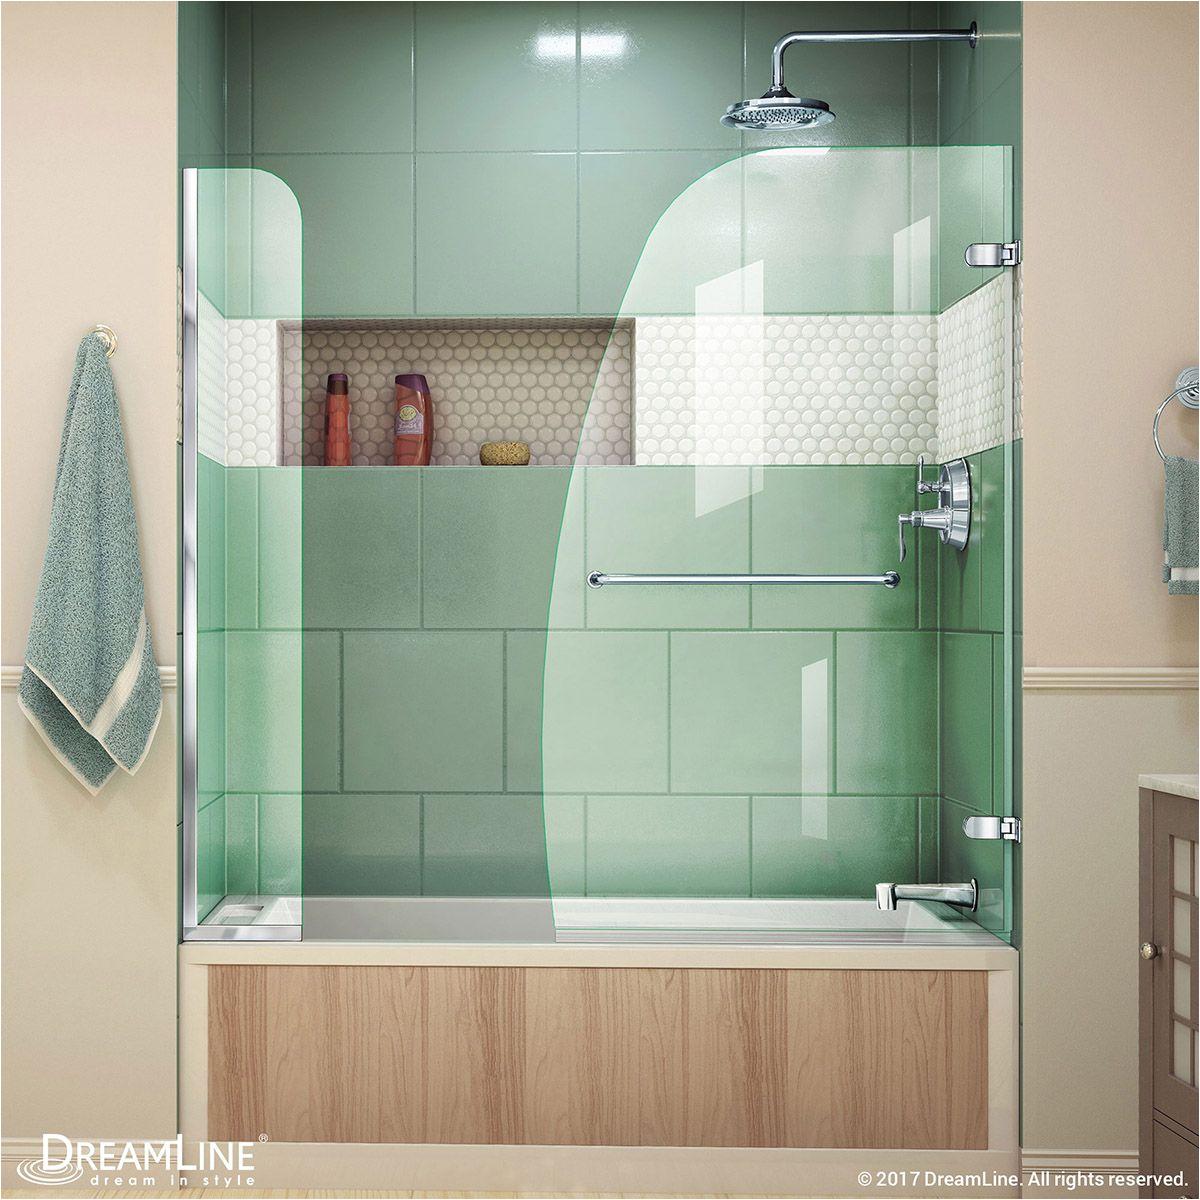 aqua uno 56 60 w x 58 h frameless hinged tub door with extender panel